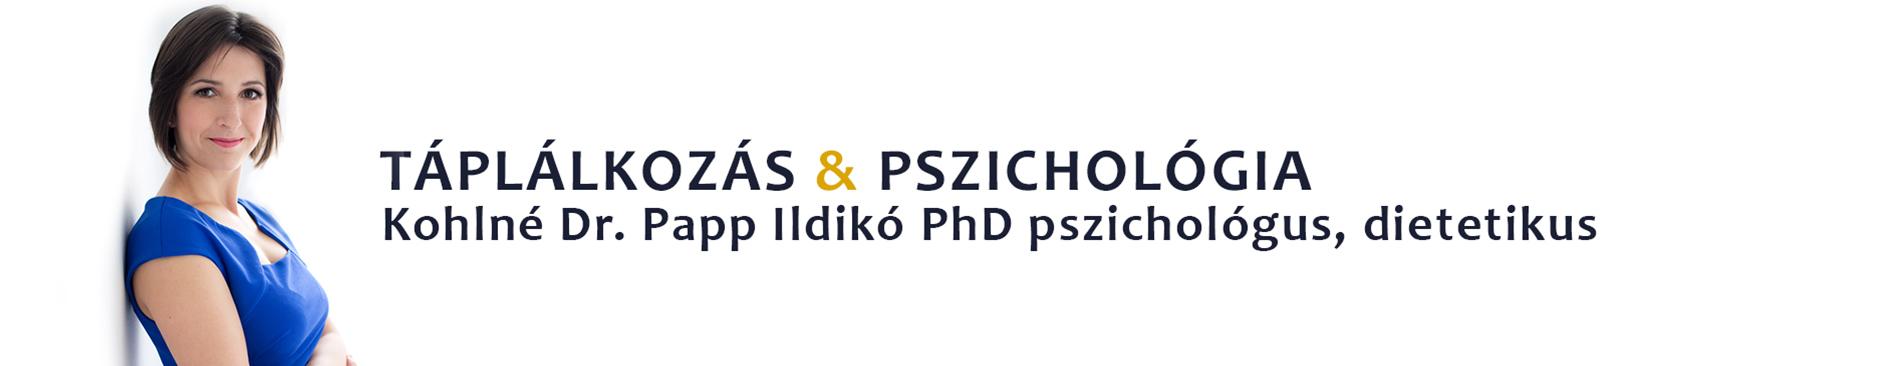 KohlnéPappIldikó.hu Logo